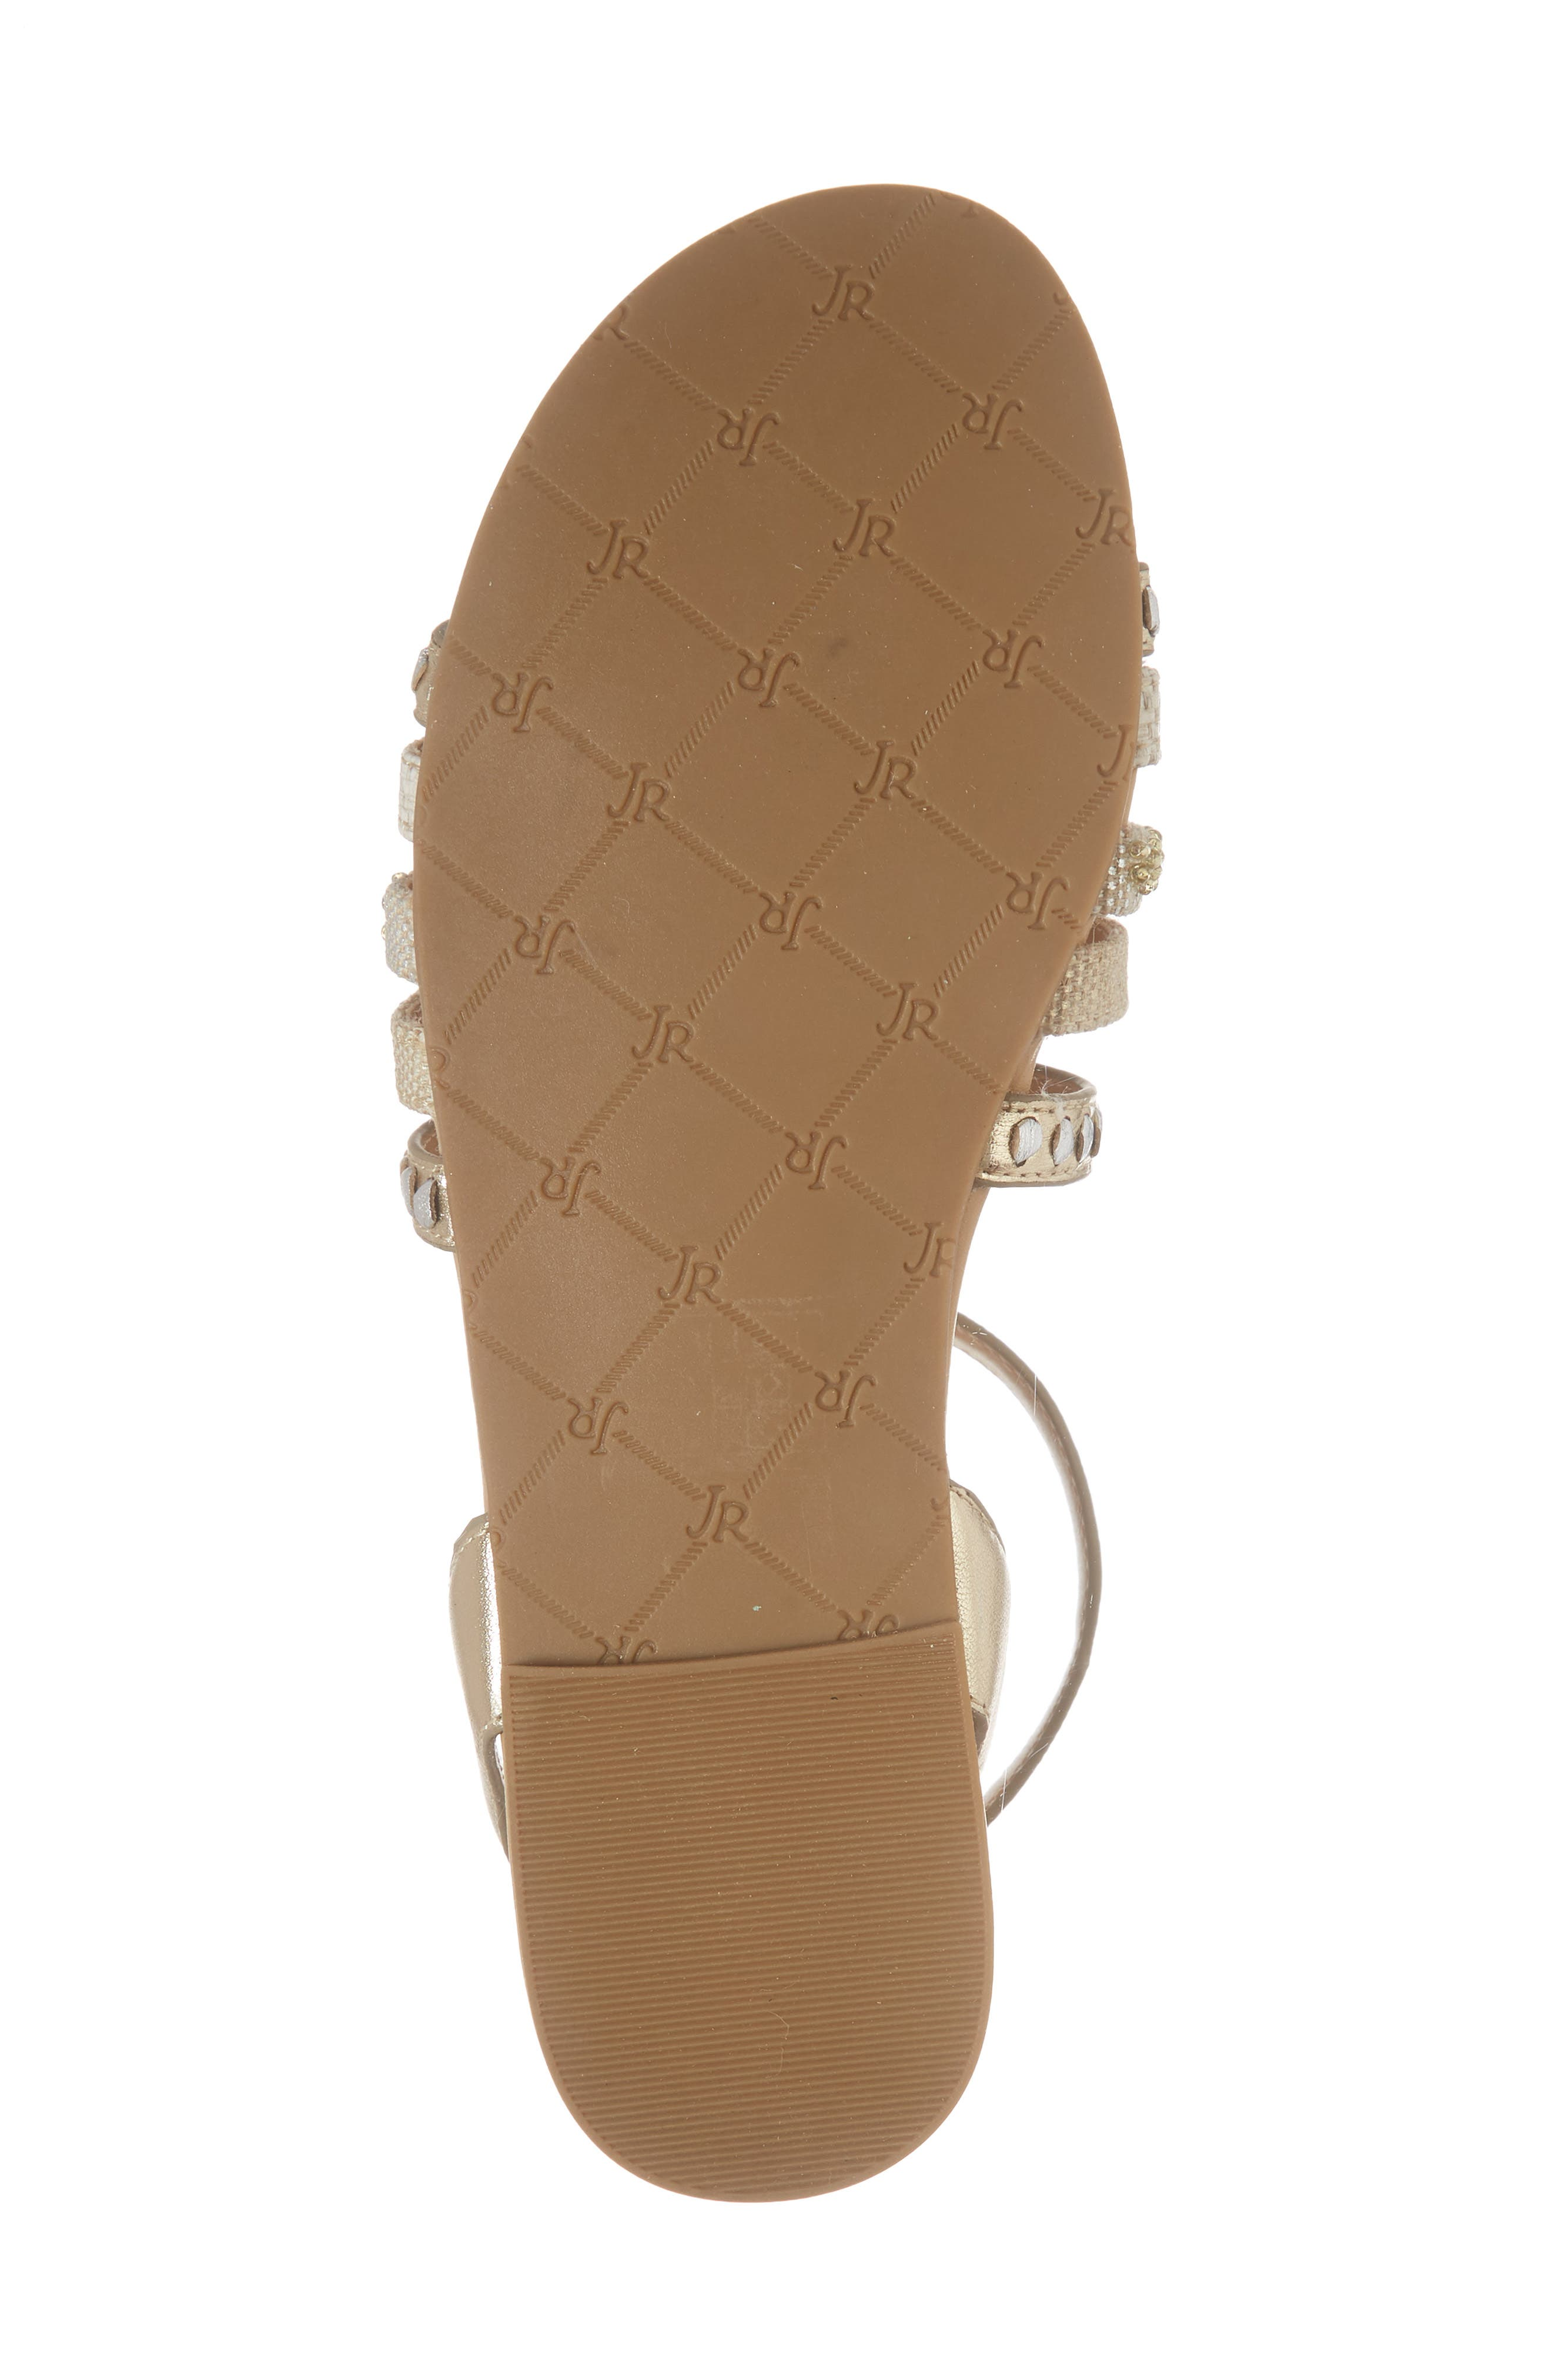 Hannah Braided Embellished Sandal,                             Alternate thumbnail 6, color,                             Platinum/ Silver Leather